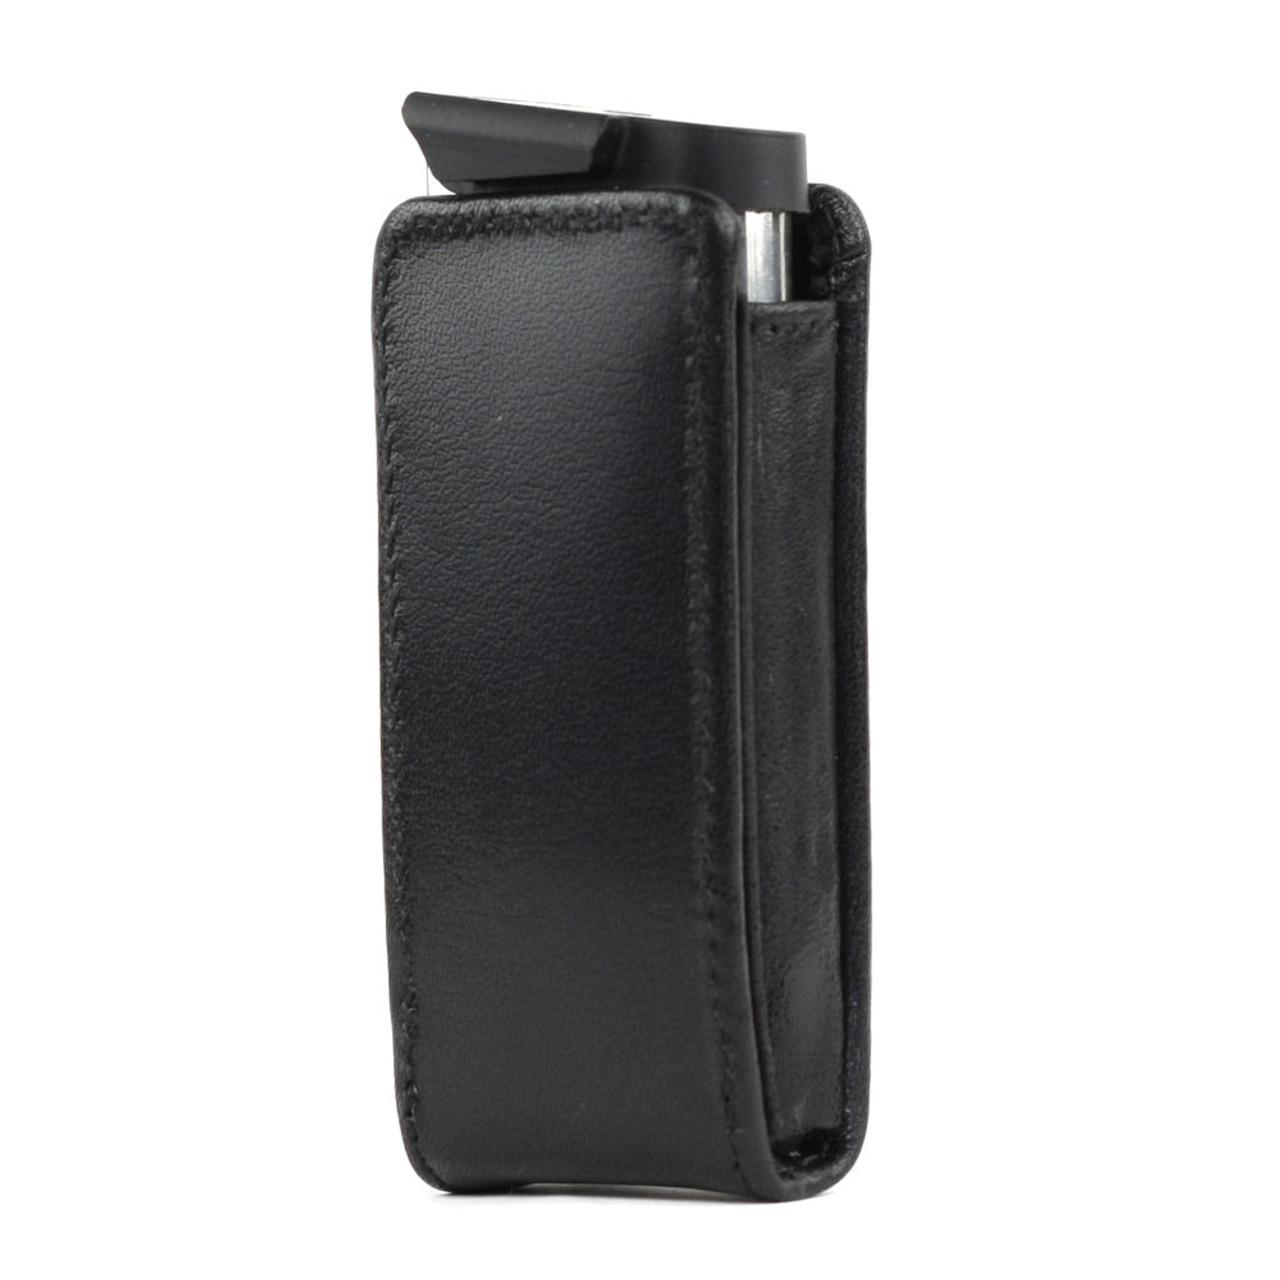 Boberg XR9-L Magazine Pocket Protector